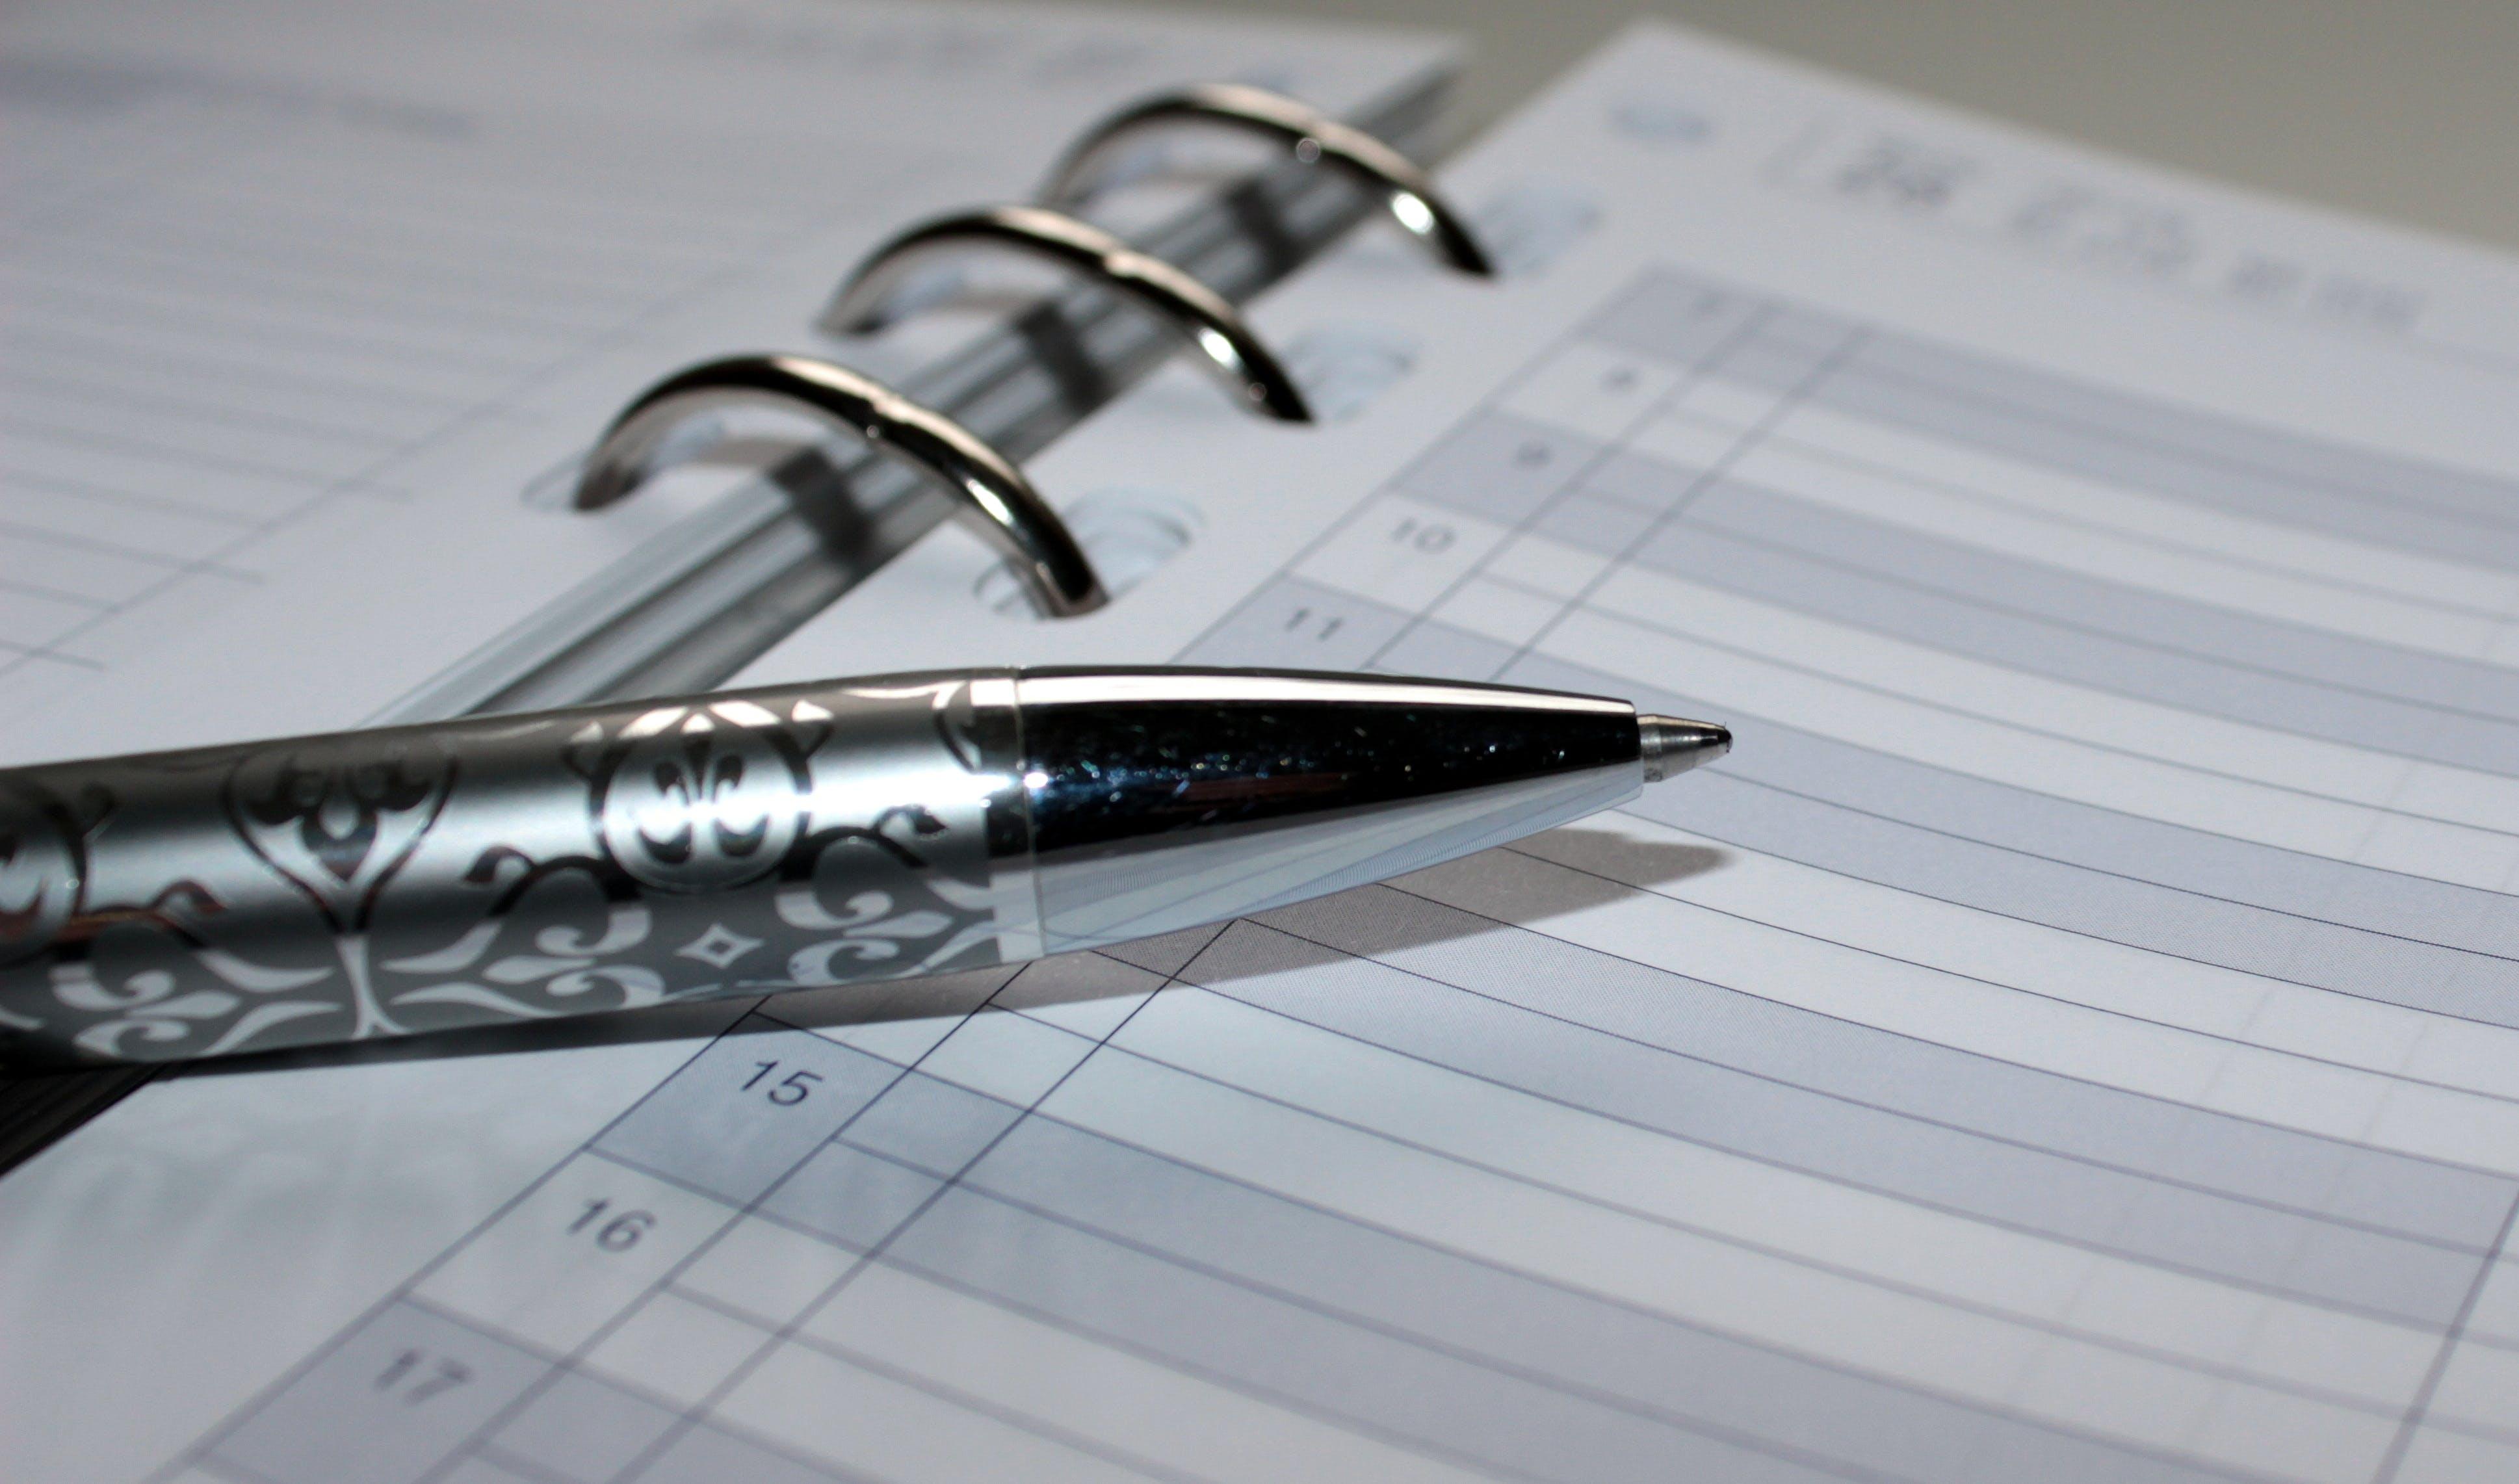 Gray Pen on Notebook